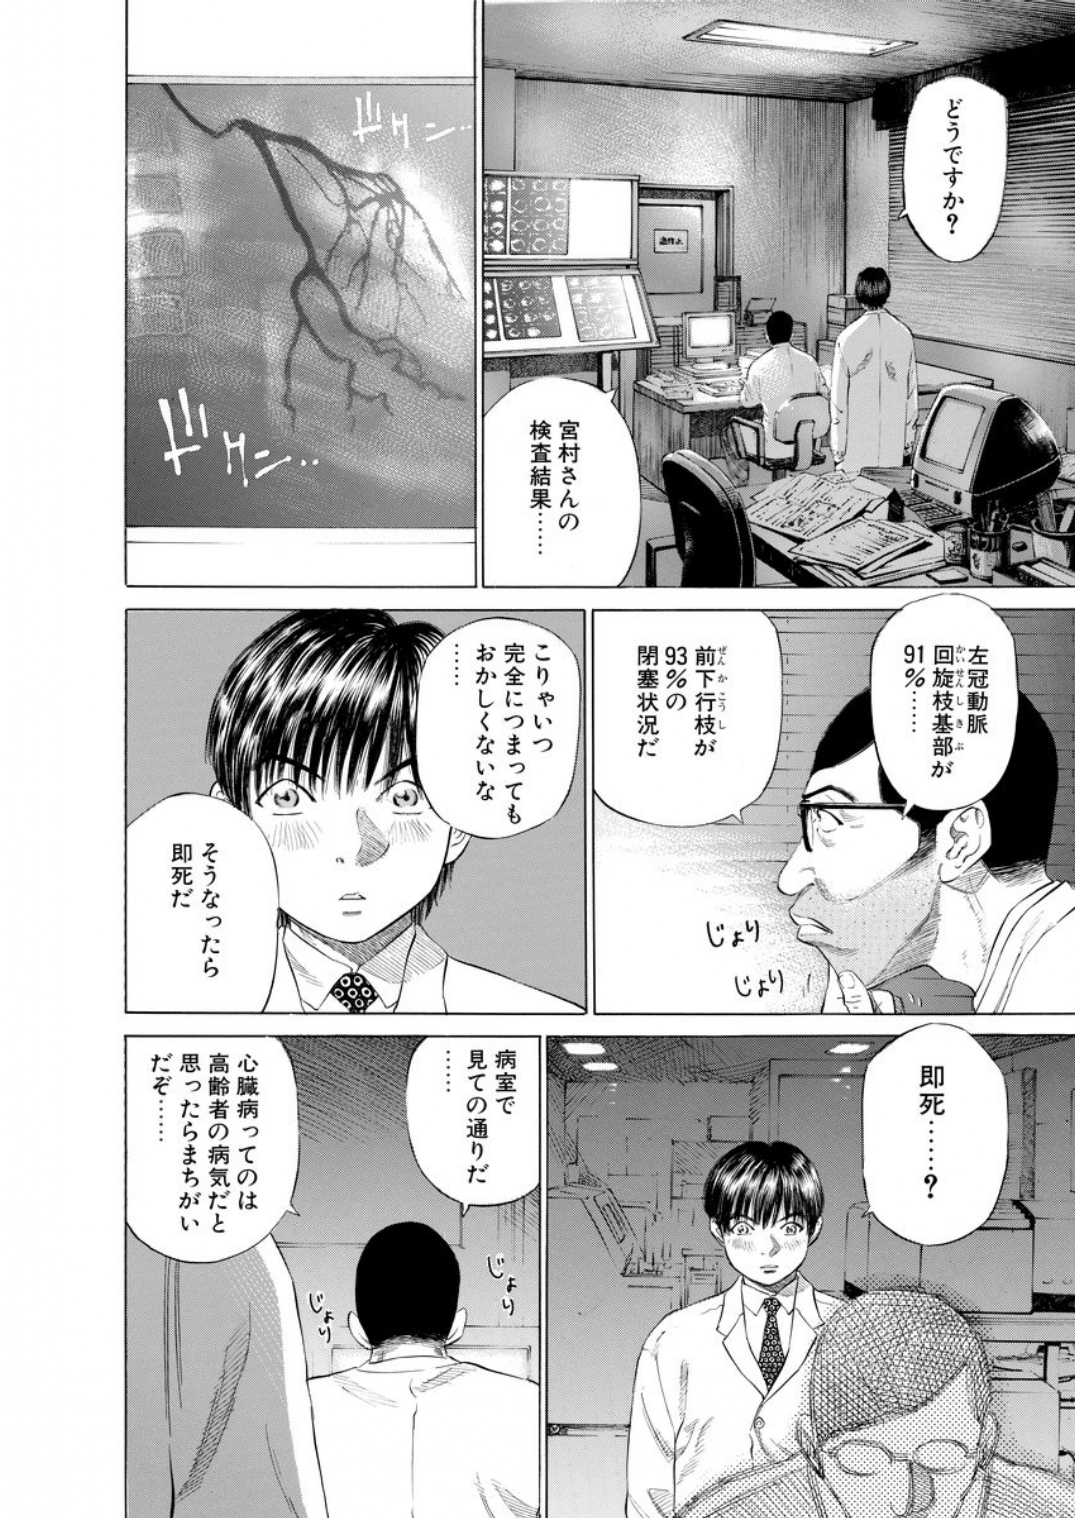 001bj_page-0172.jpg